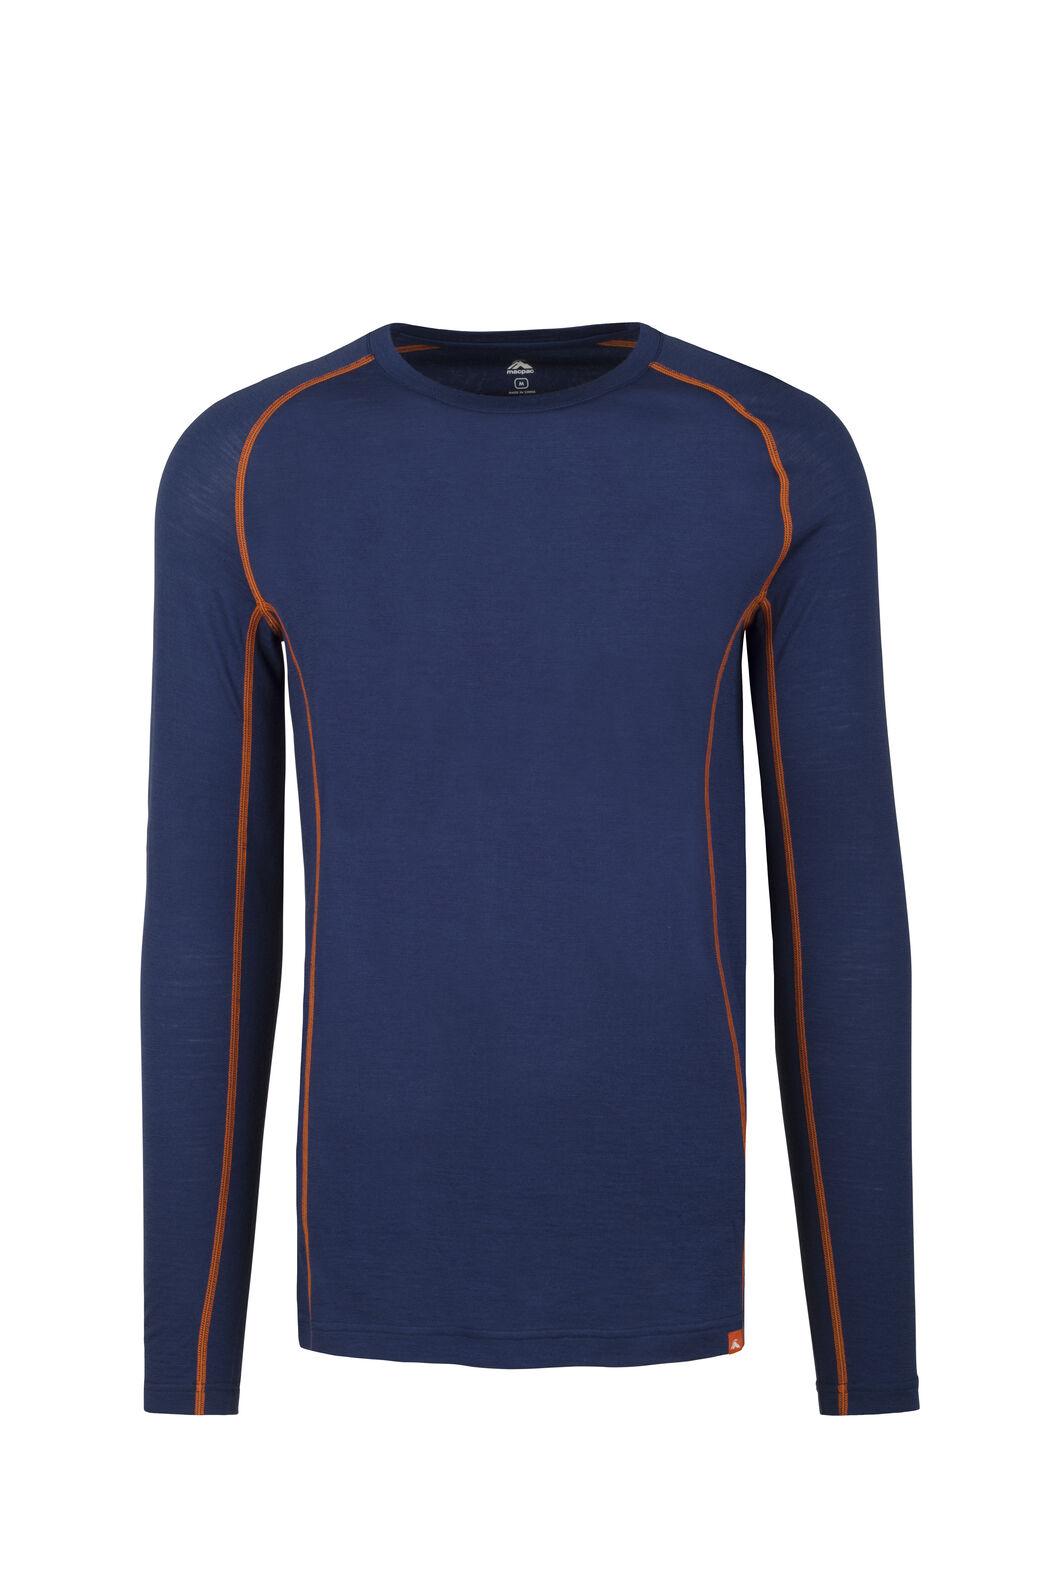 Macpac 150 Merino Long Sleeve Top - Men's, Blue Depths/Burnt Orange, hi-res